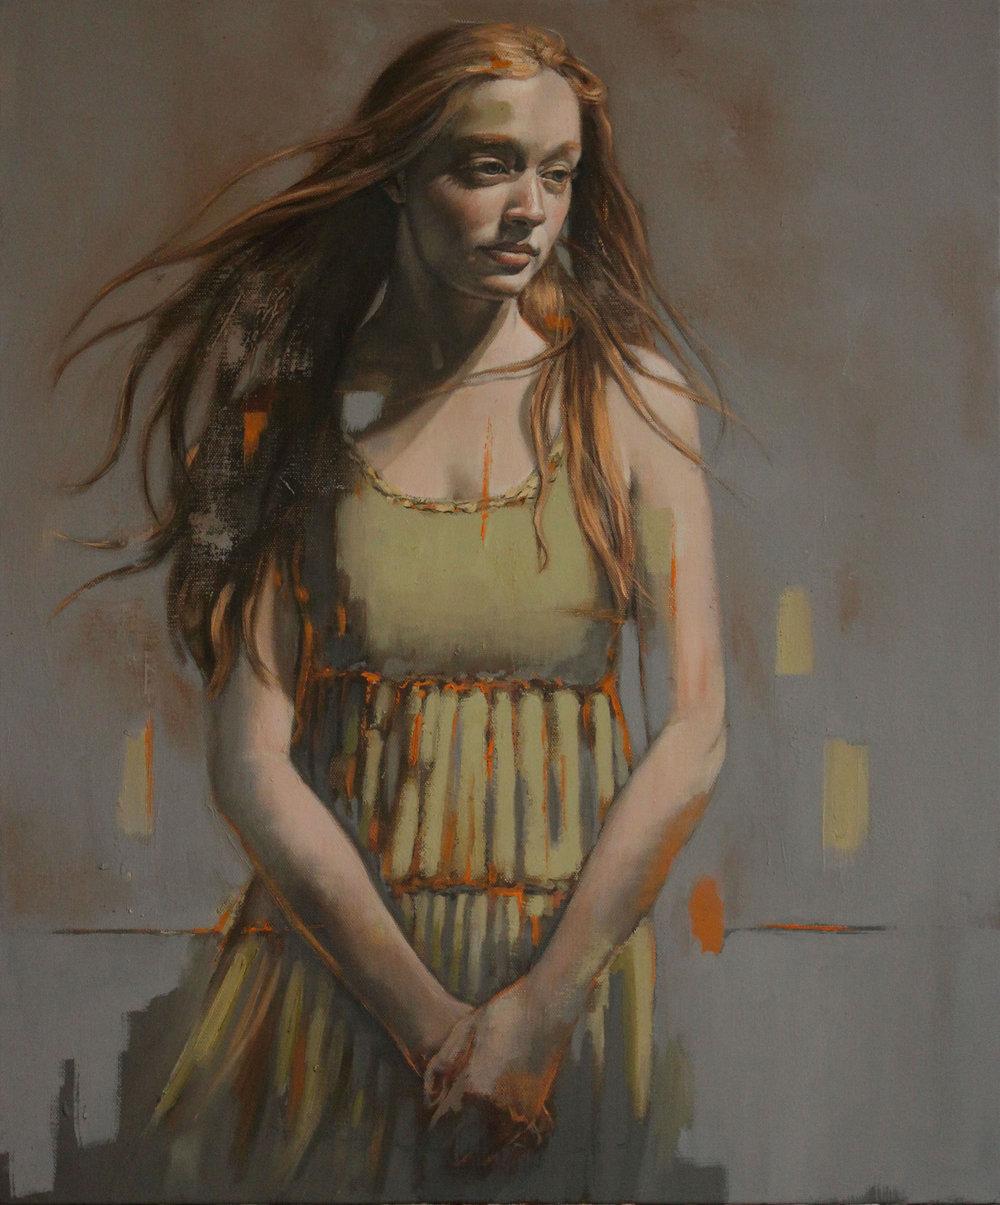 Girl in Green Dress - 50x60cm